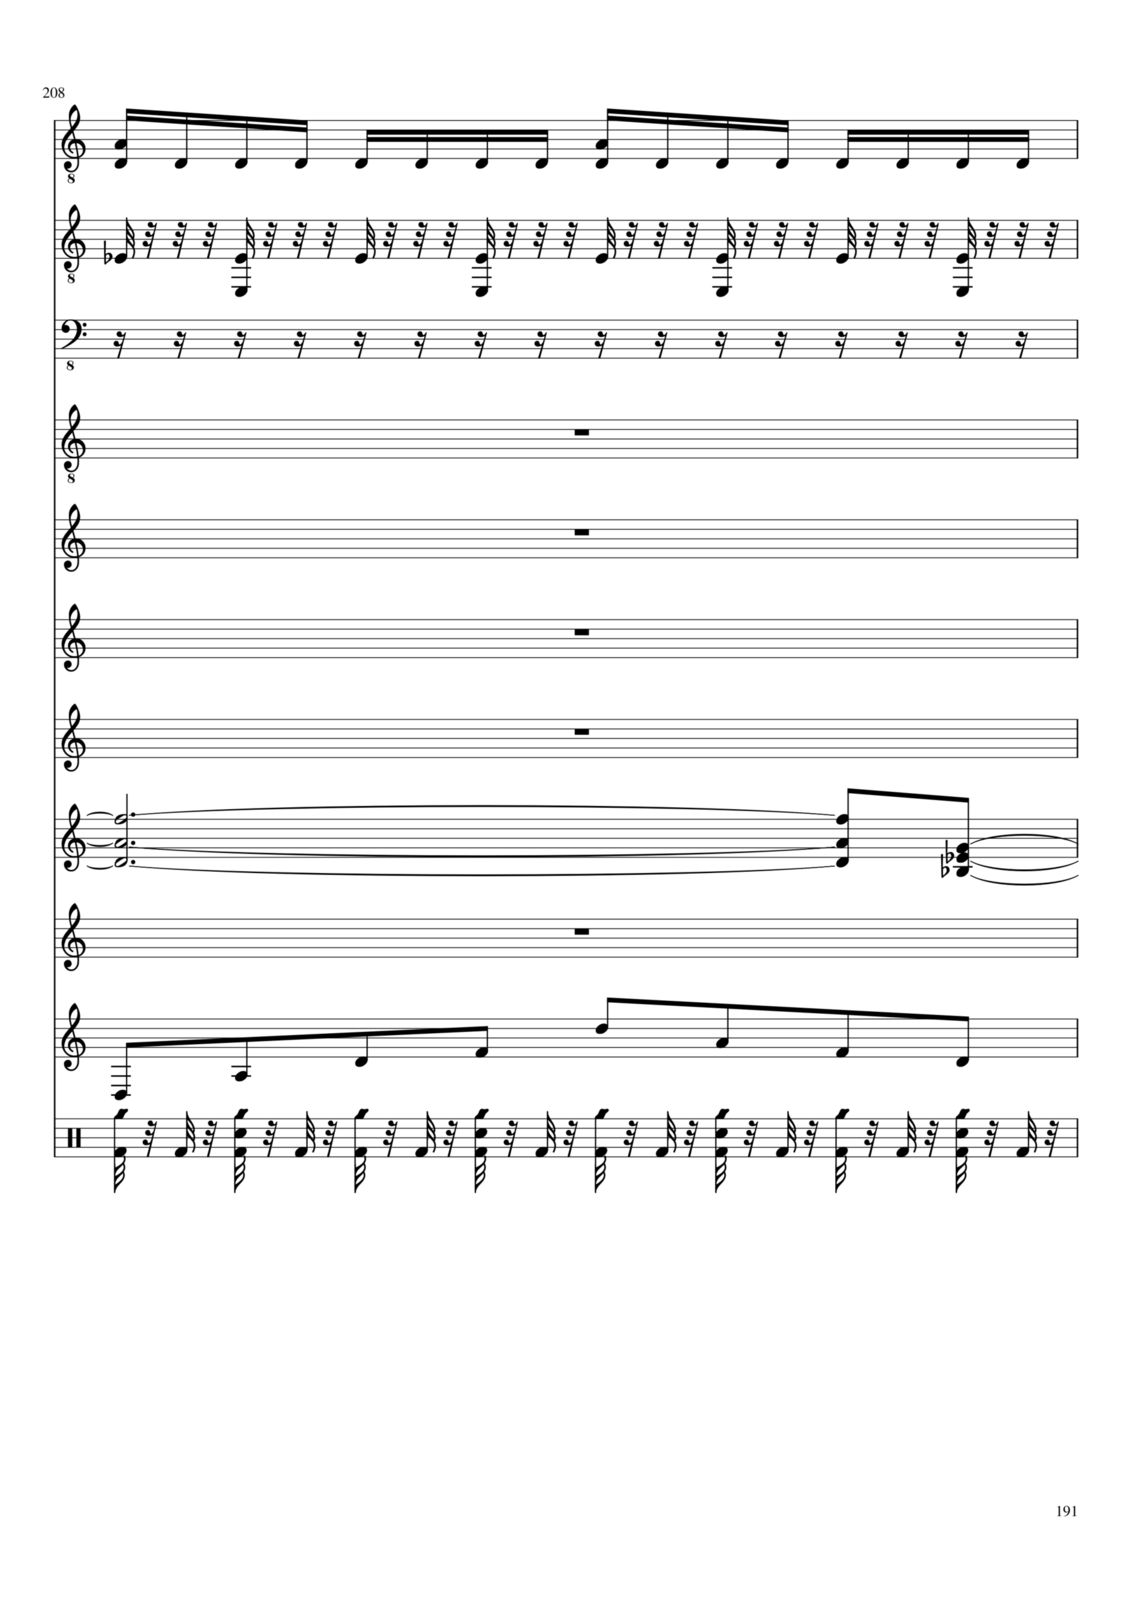 Belyiy sokol slide, Image 191